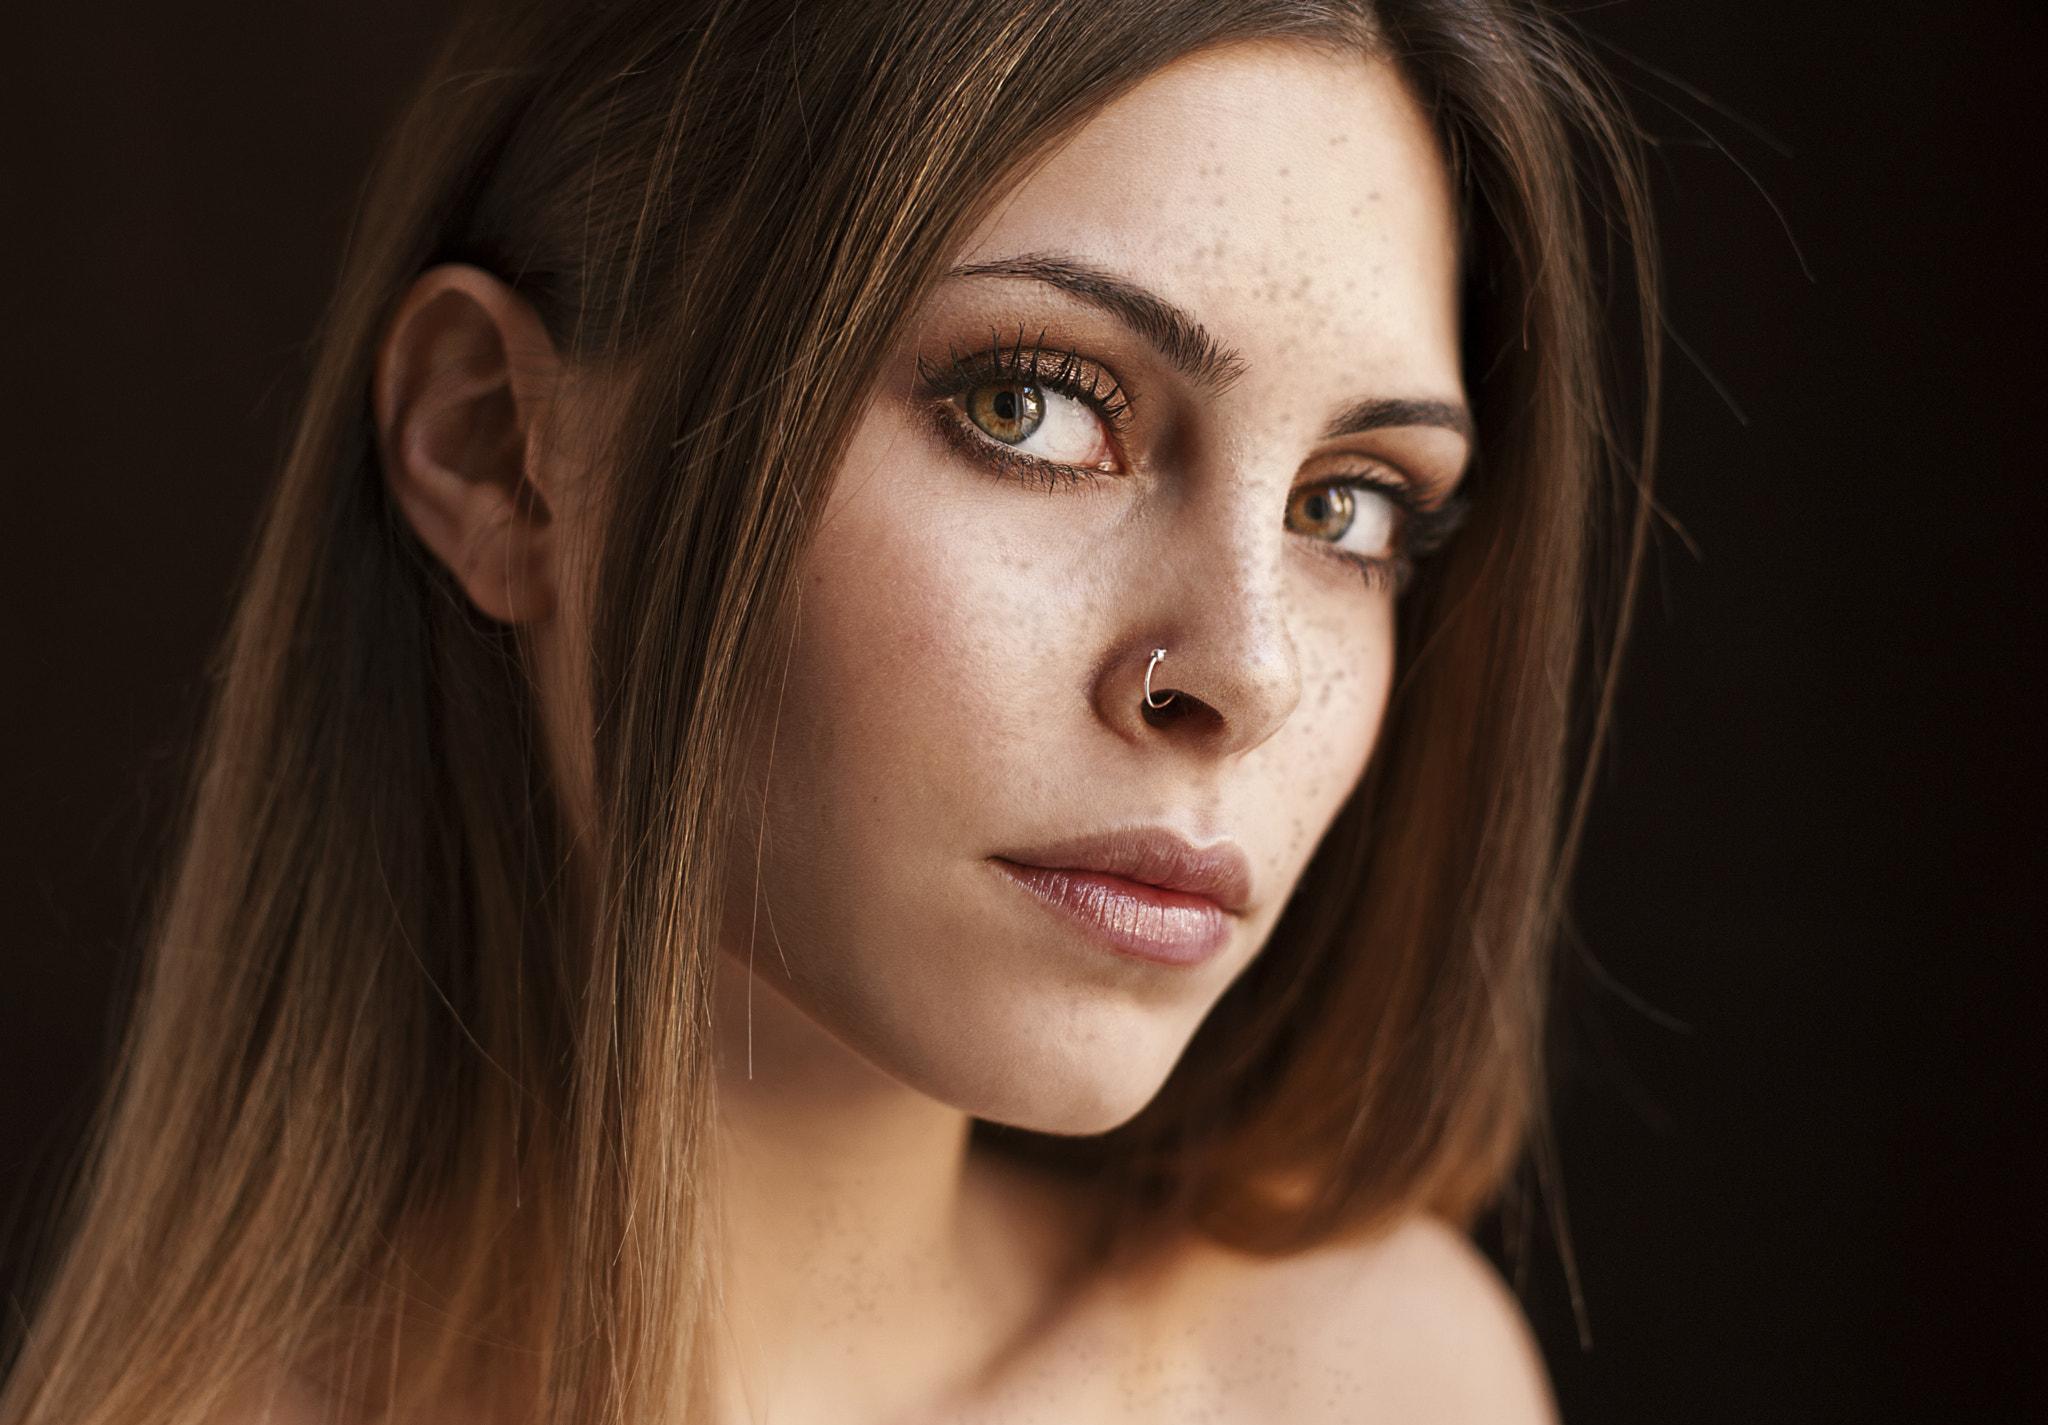 People 2048x1425 women brunette hazel eyes long hair pierced nose freckles portrait face closeup